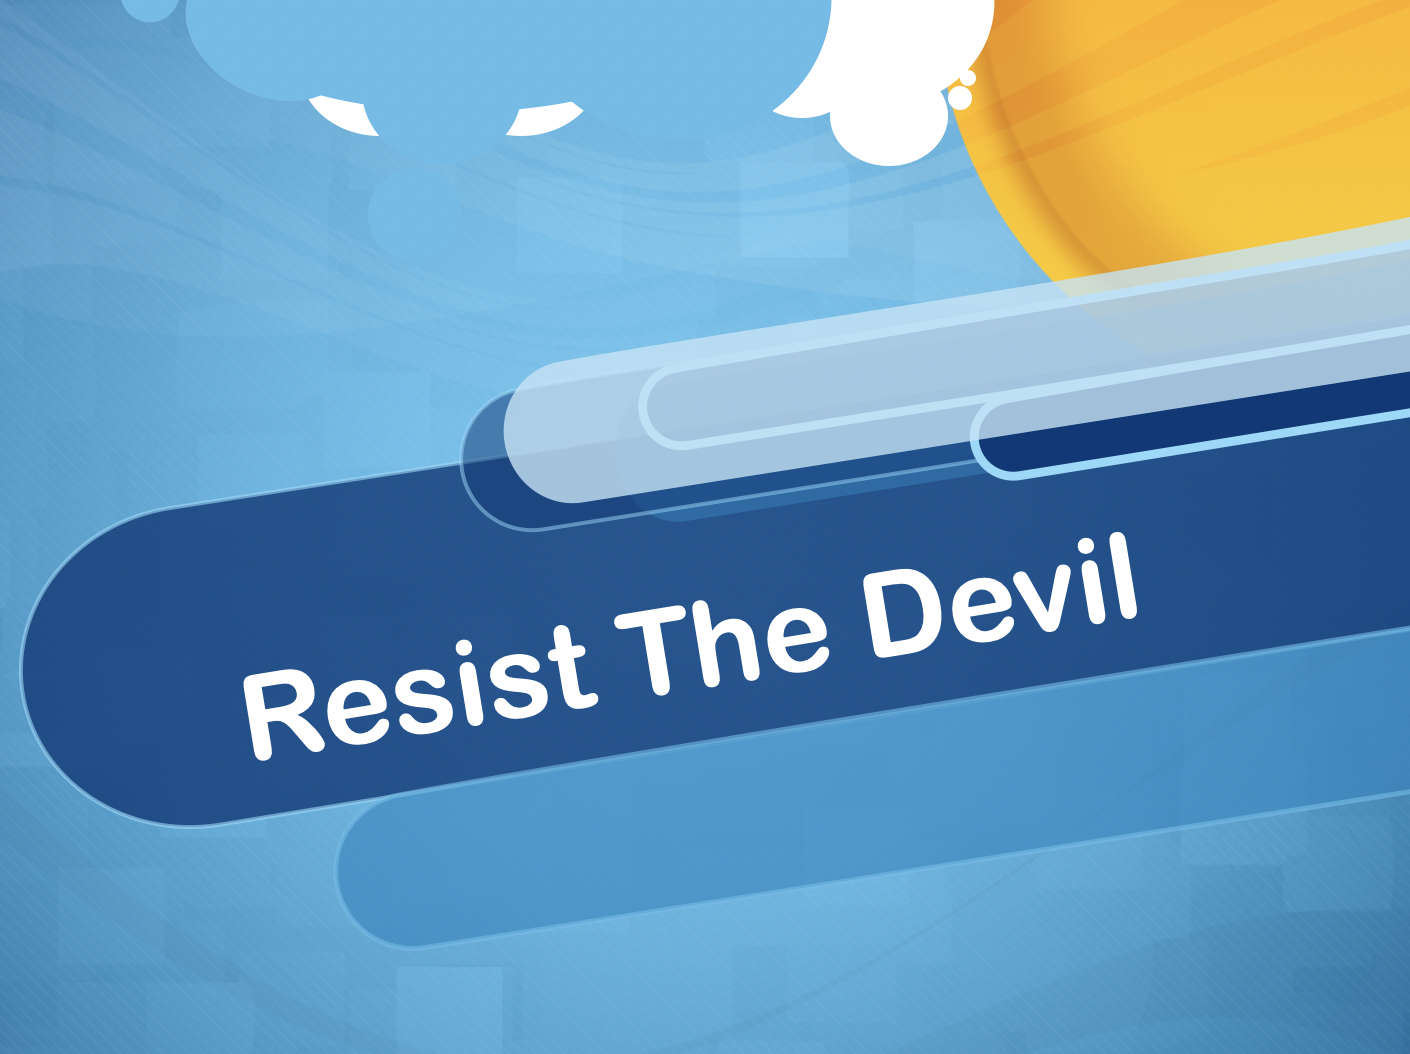 Watch/Listen Resist The Devil